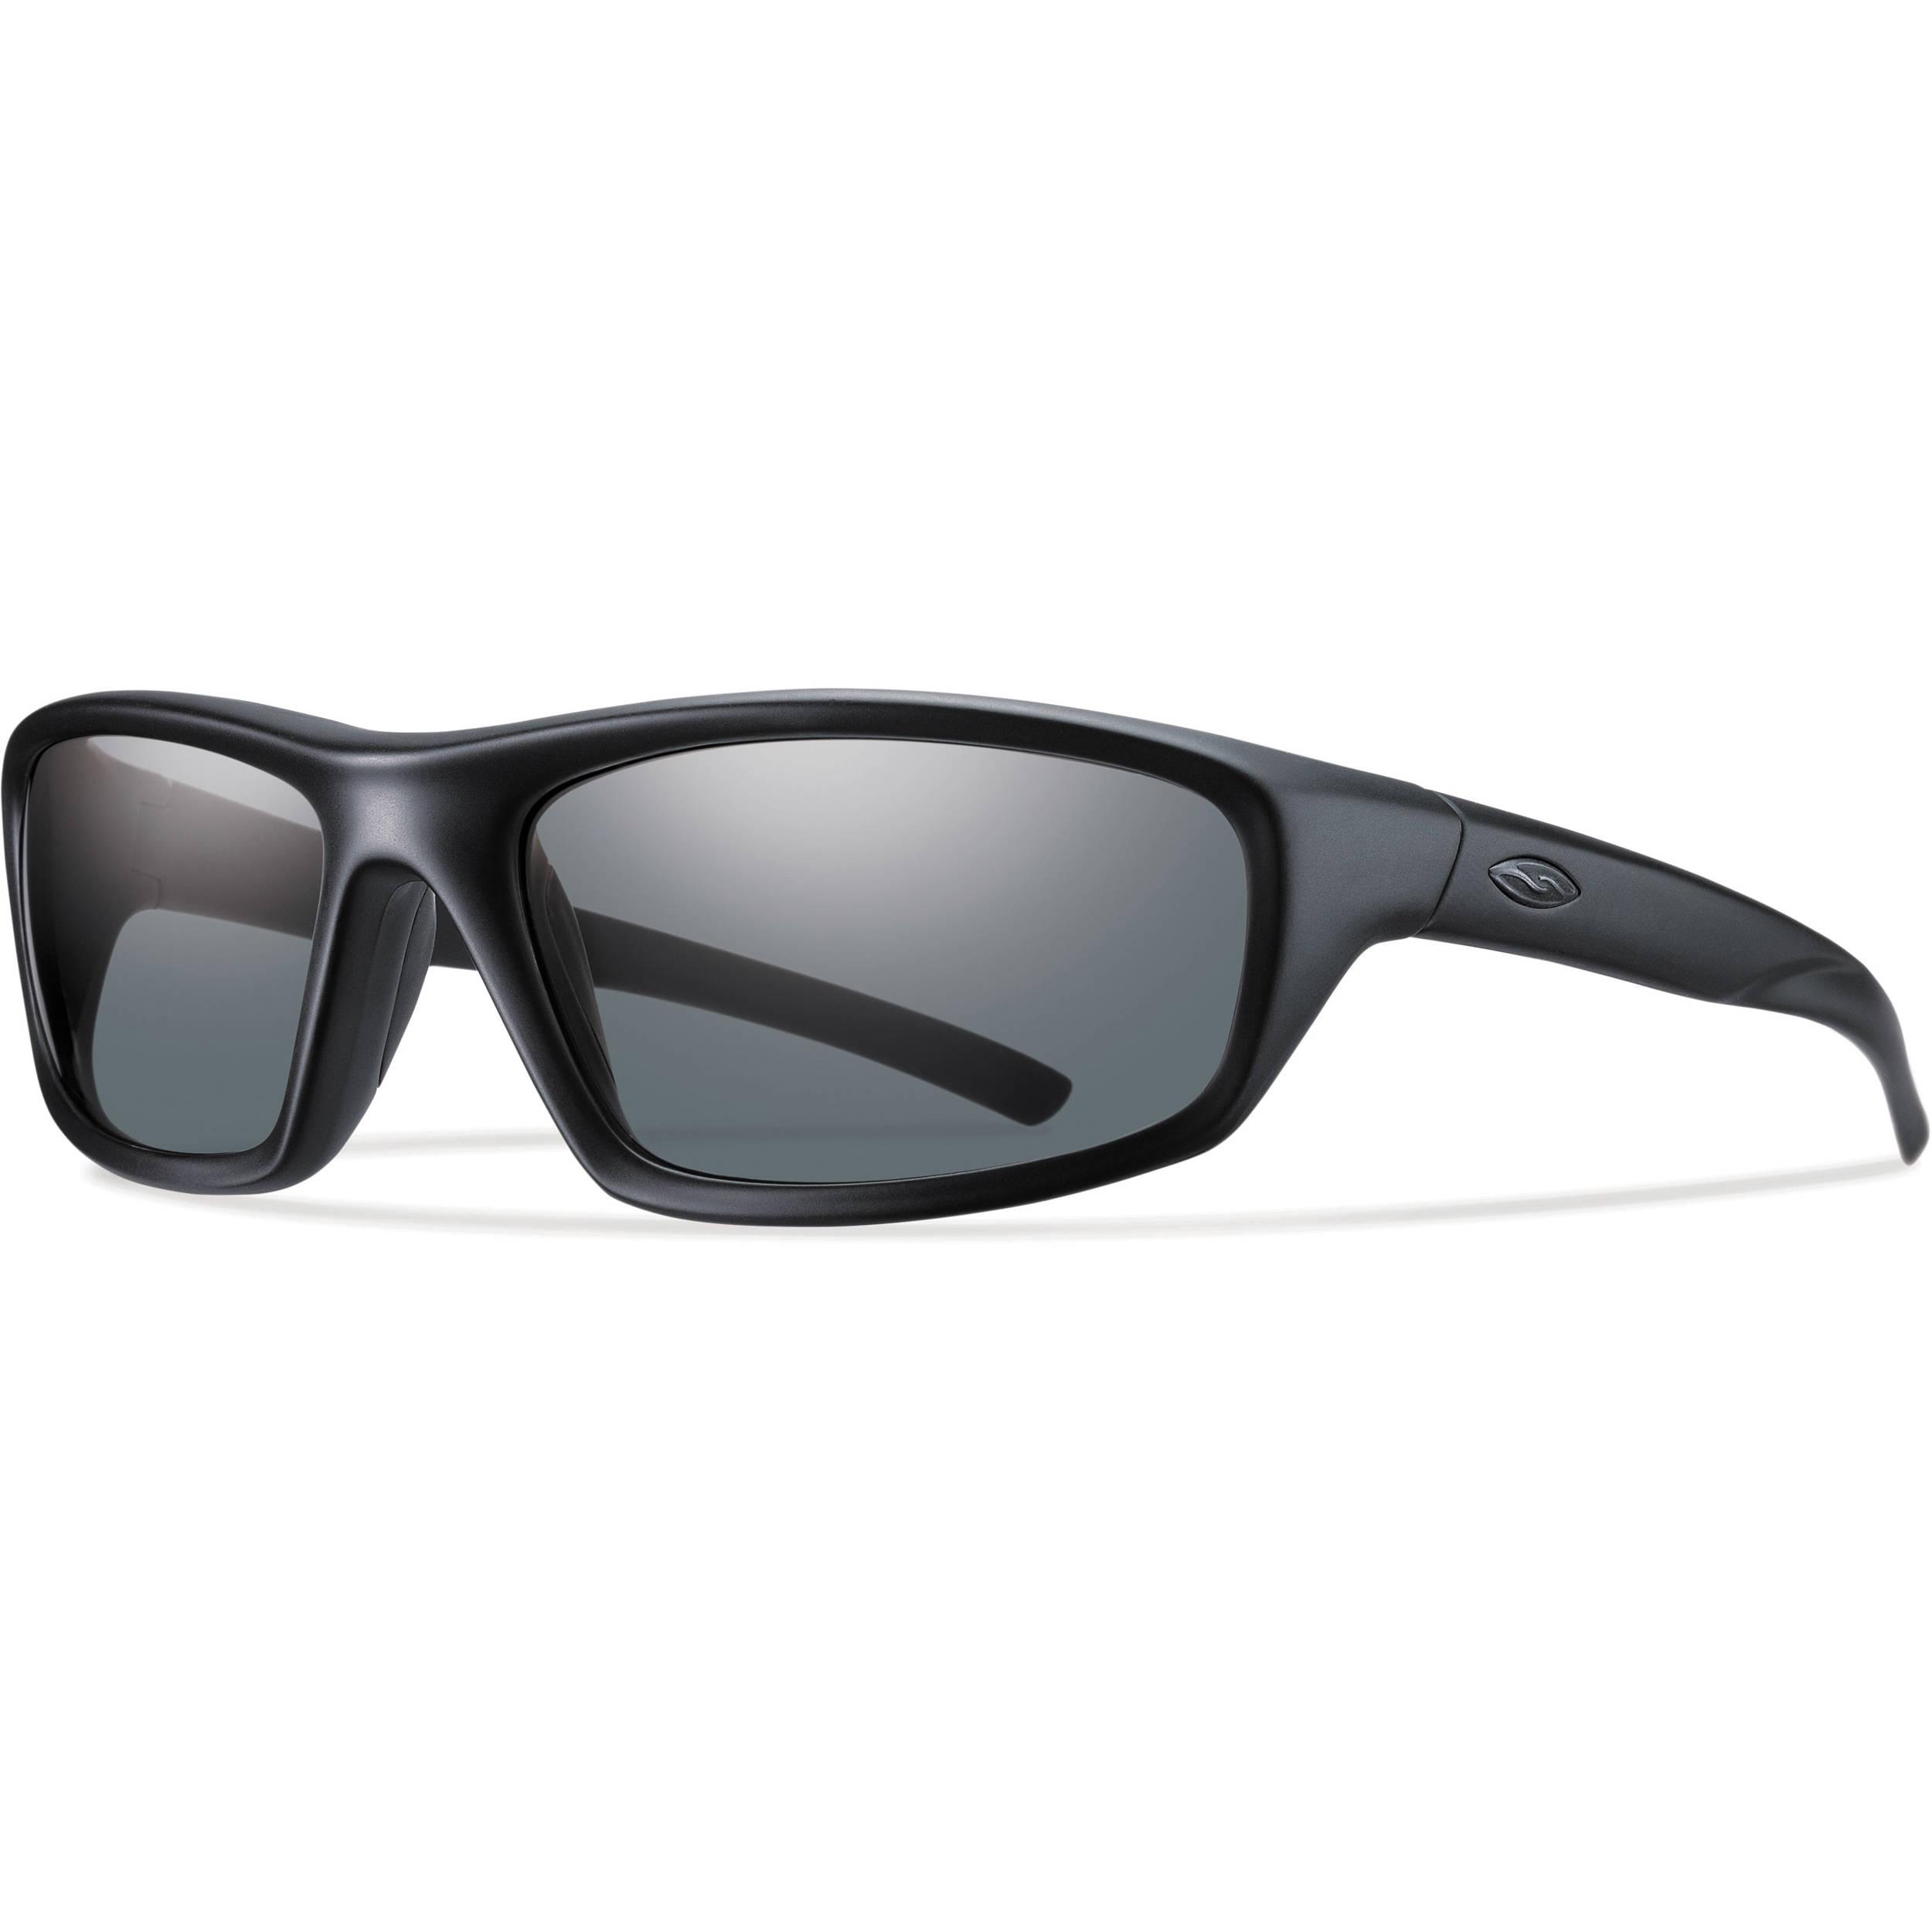 866498f2e3 Smith Optics Director Elite Tactical Sunglasses (Black - Polarized Gray Lens )